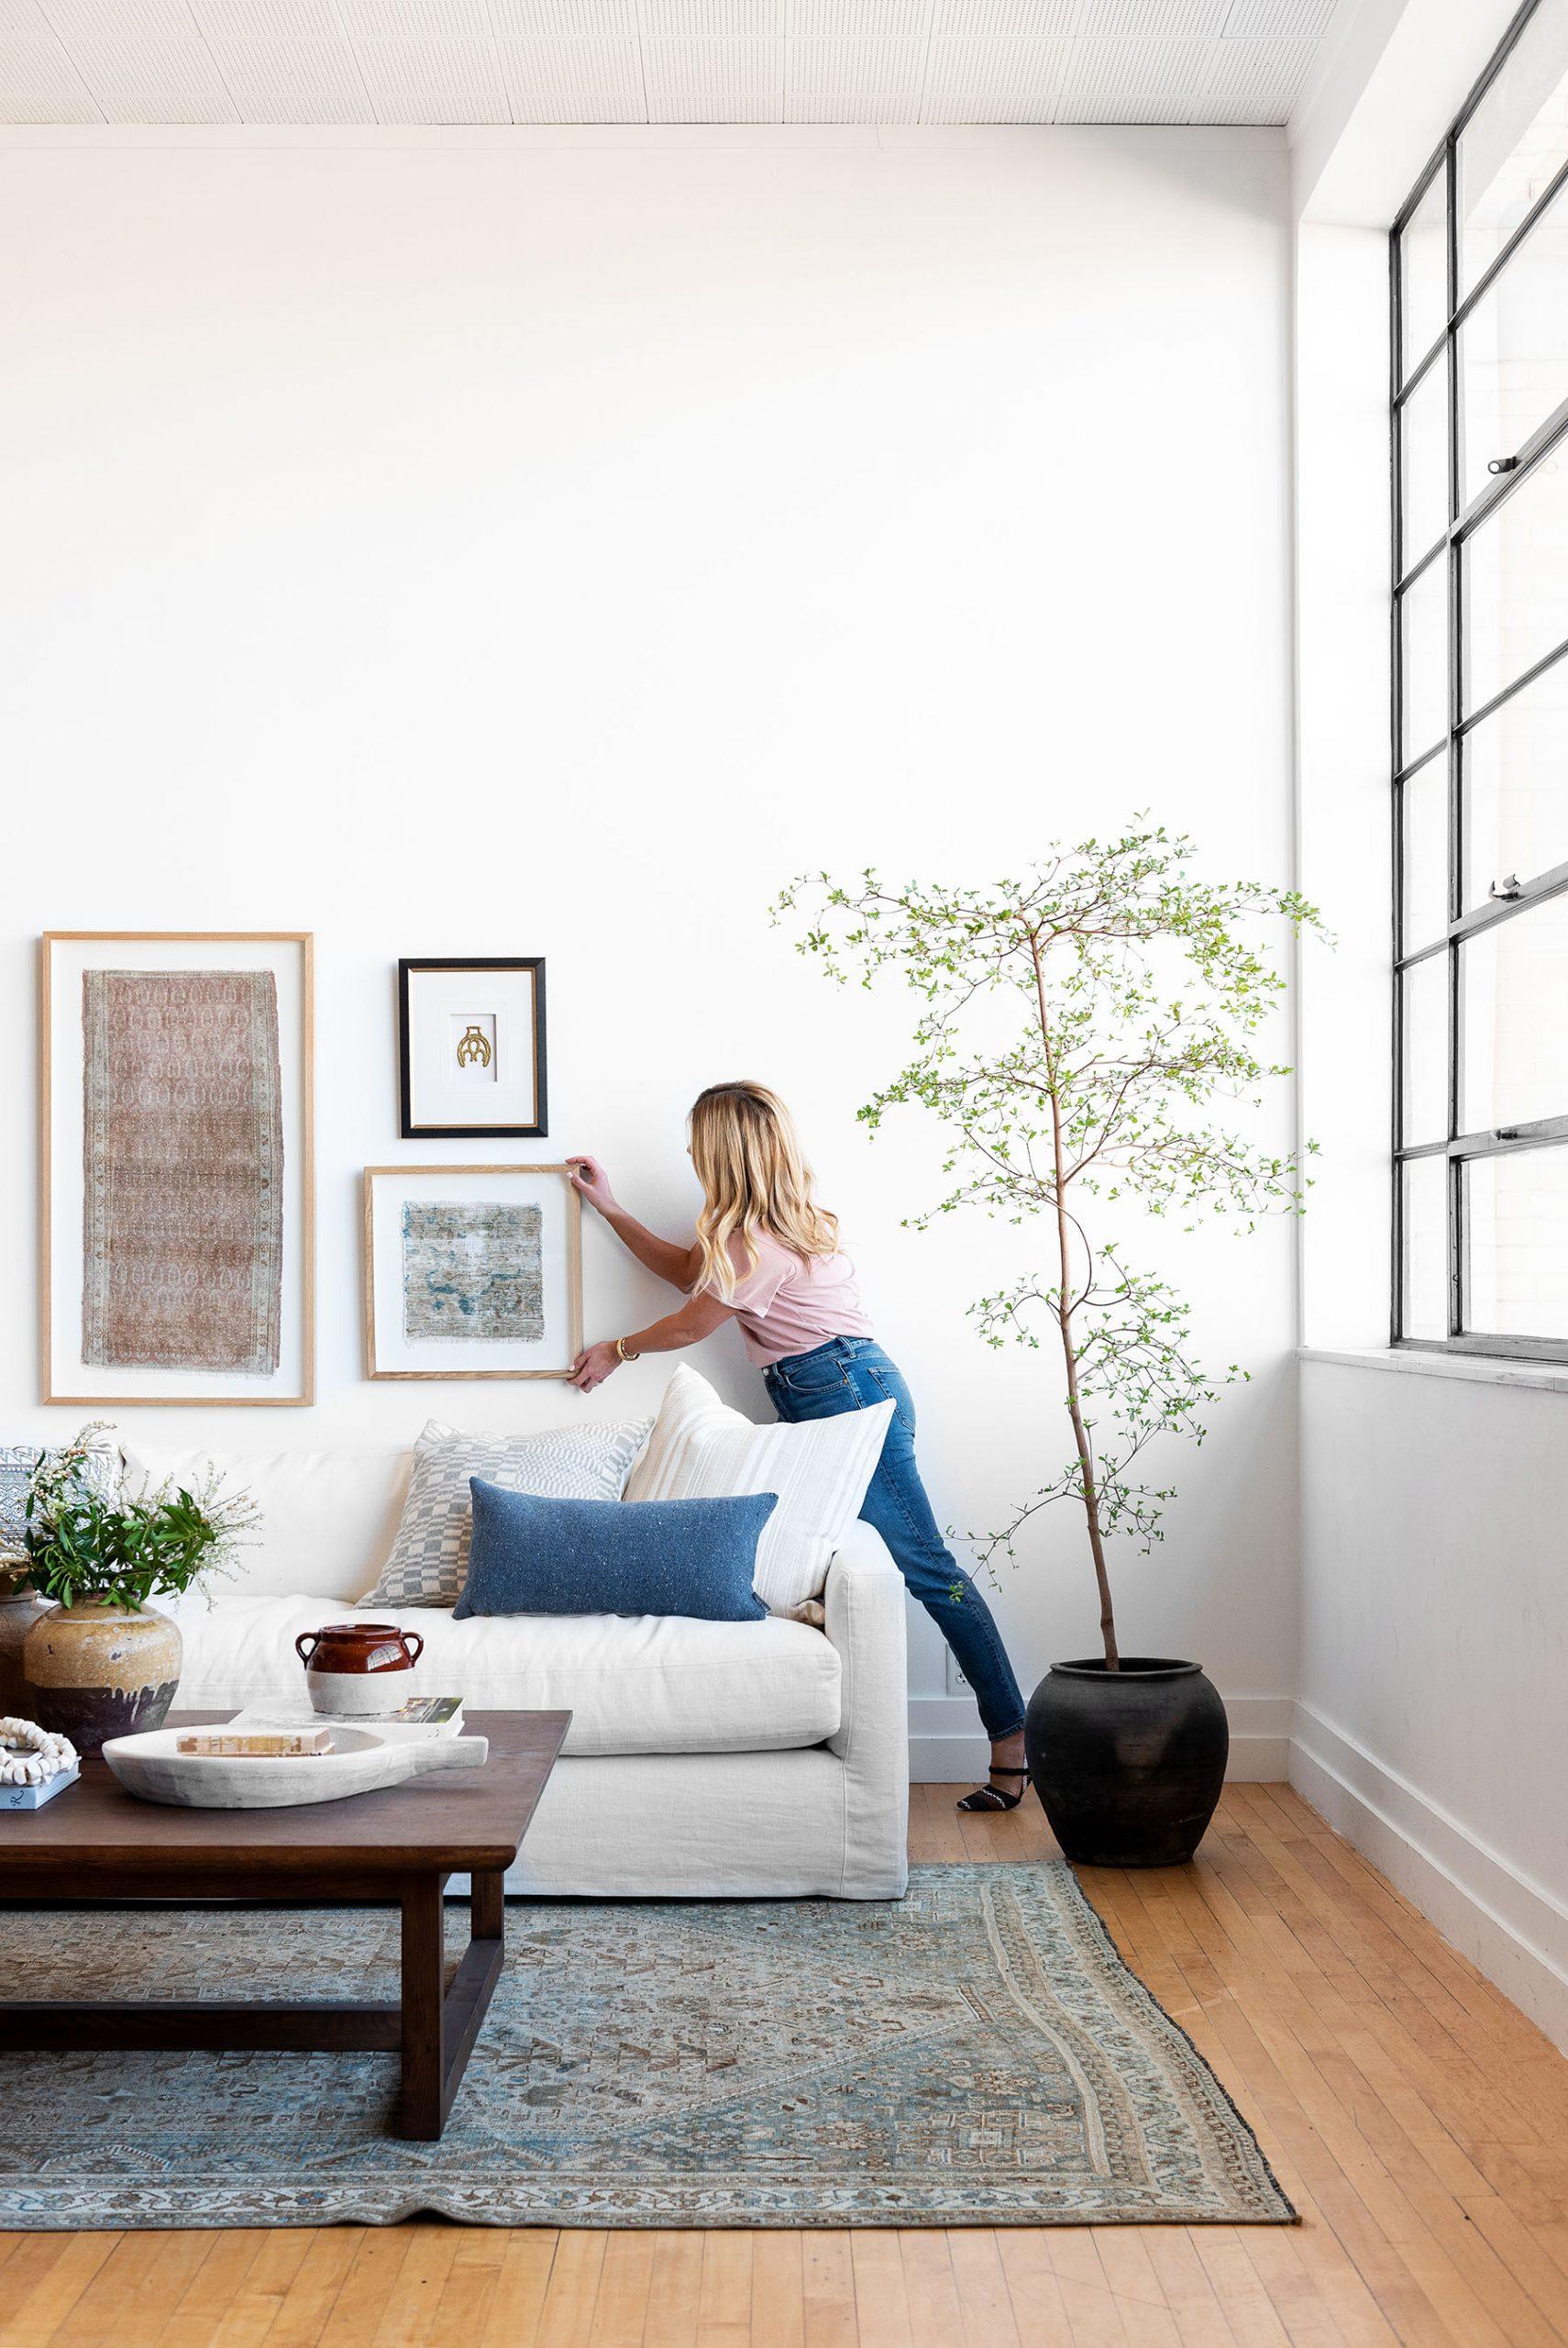 How To Hang Art Correctly 3 Simple Tips Studio Mcgee